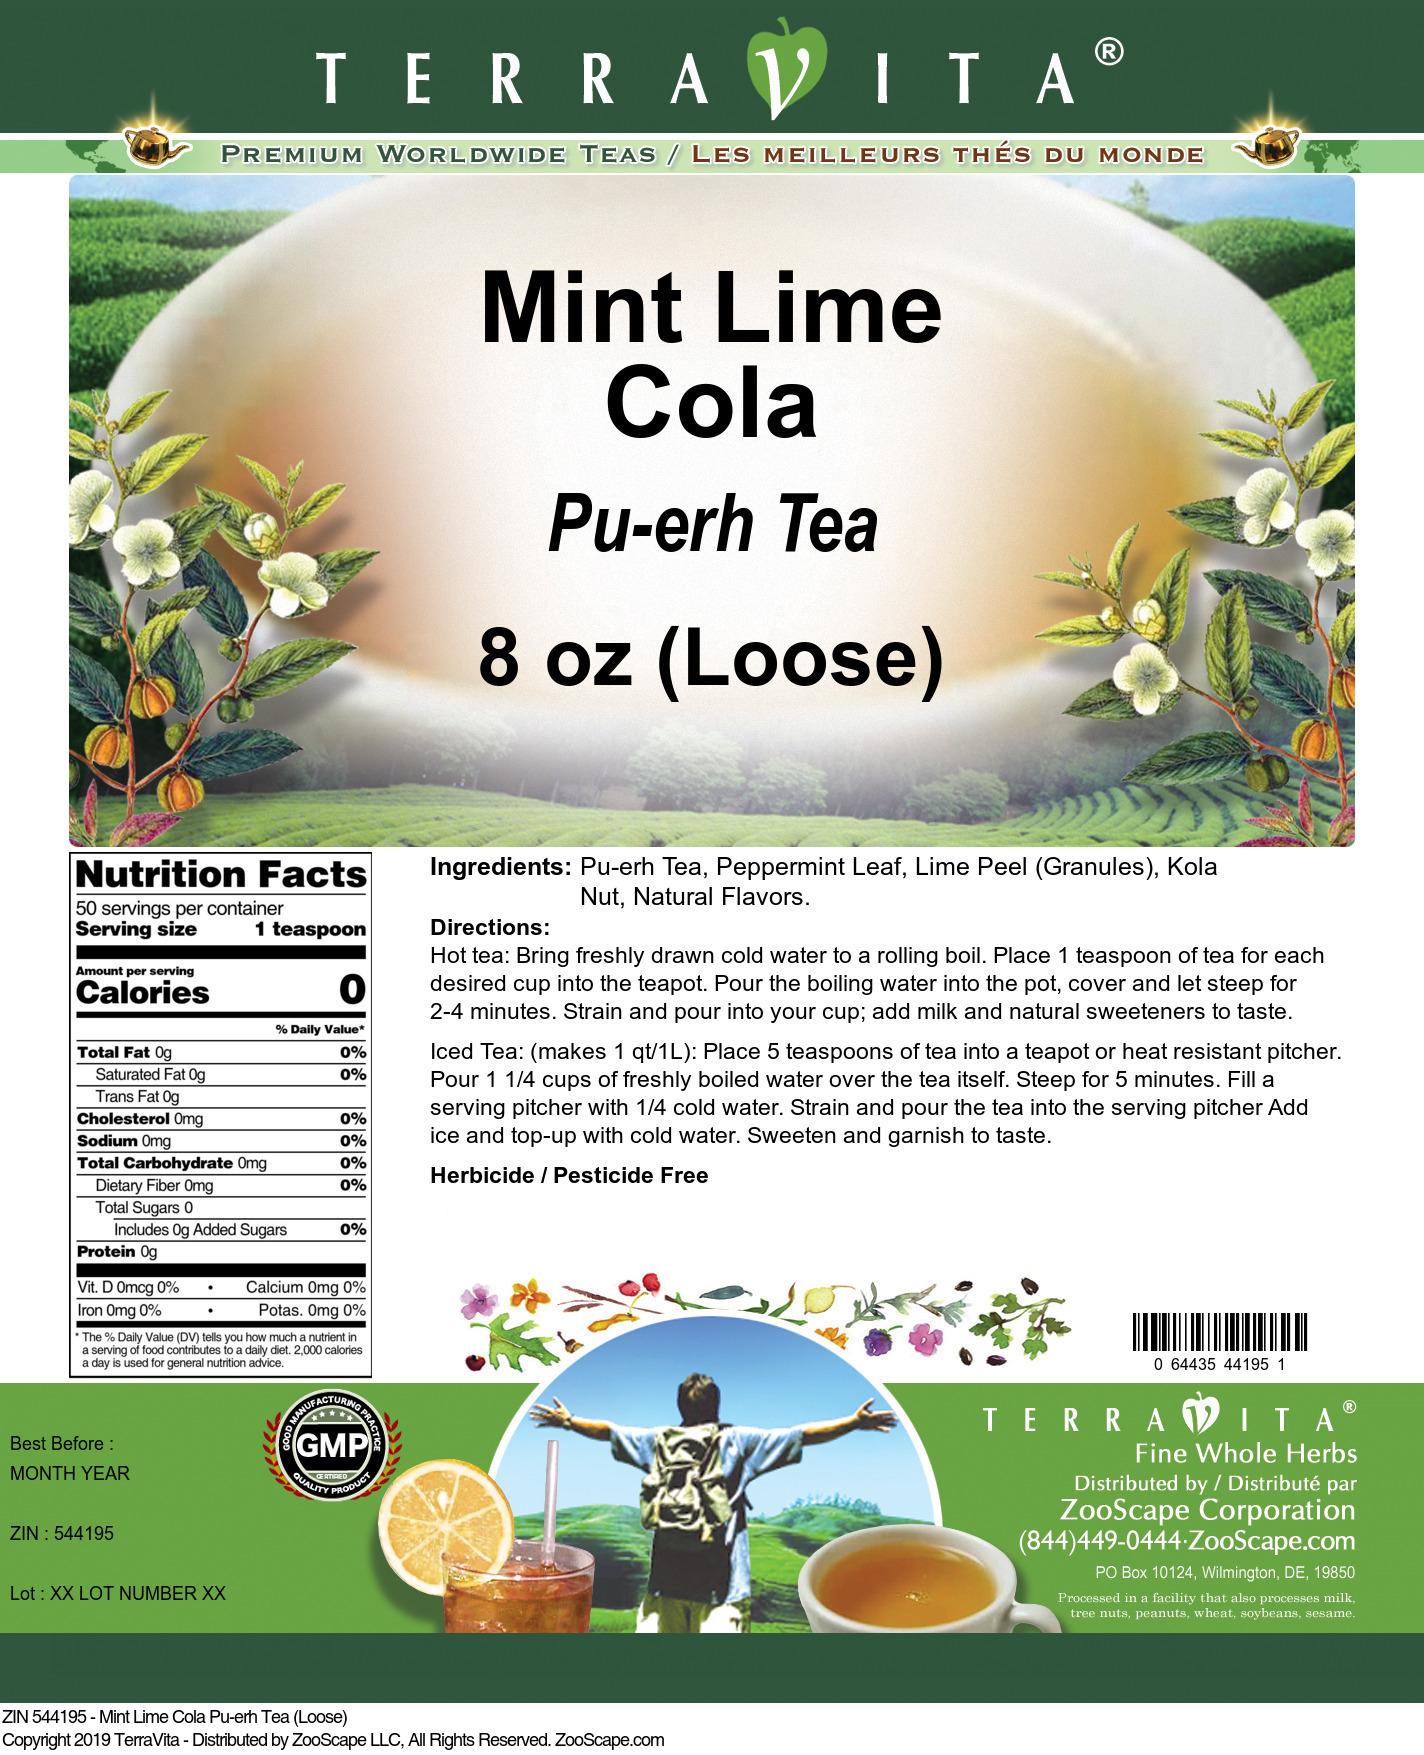 Mint Lime Cola Pu-erh Tea (Loose)